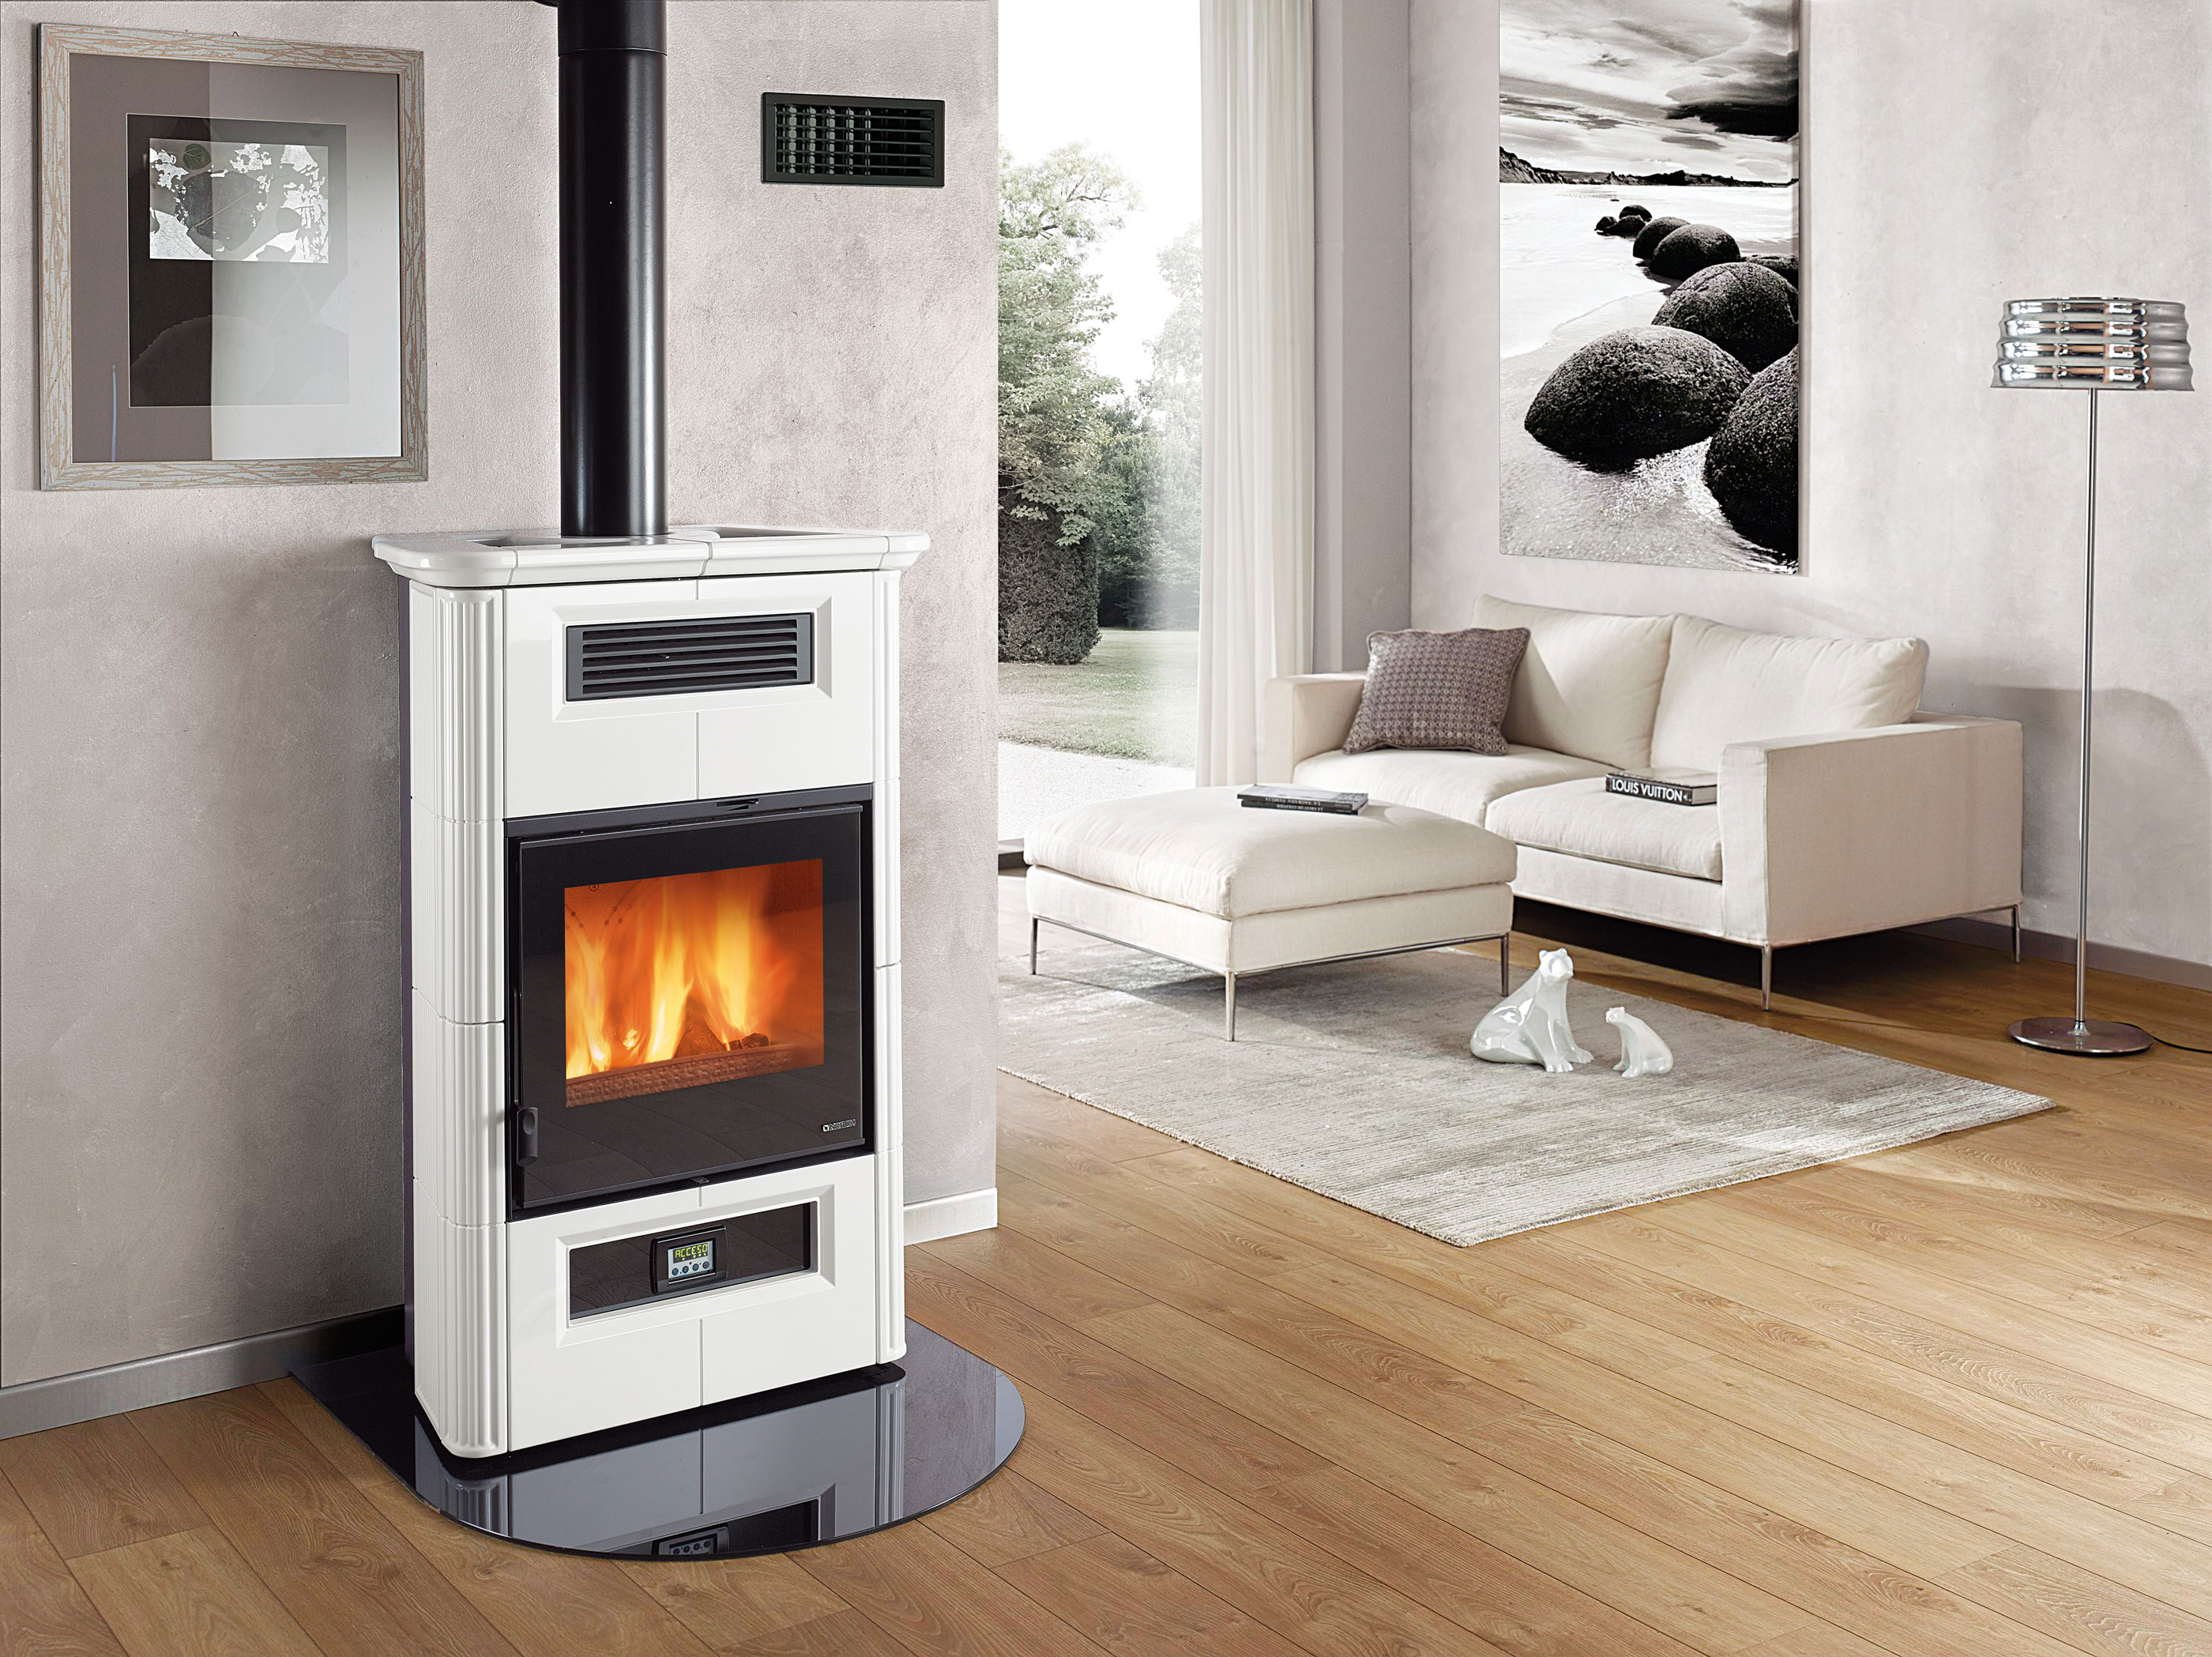 kaminofen la nordica wanda classic raumluftunabh ngig wei. Black Bedroom Furniture Sets. Home Design Ideas